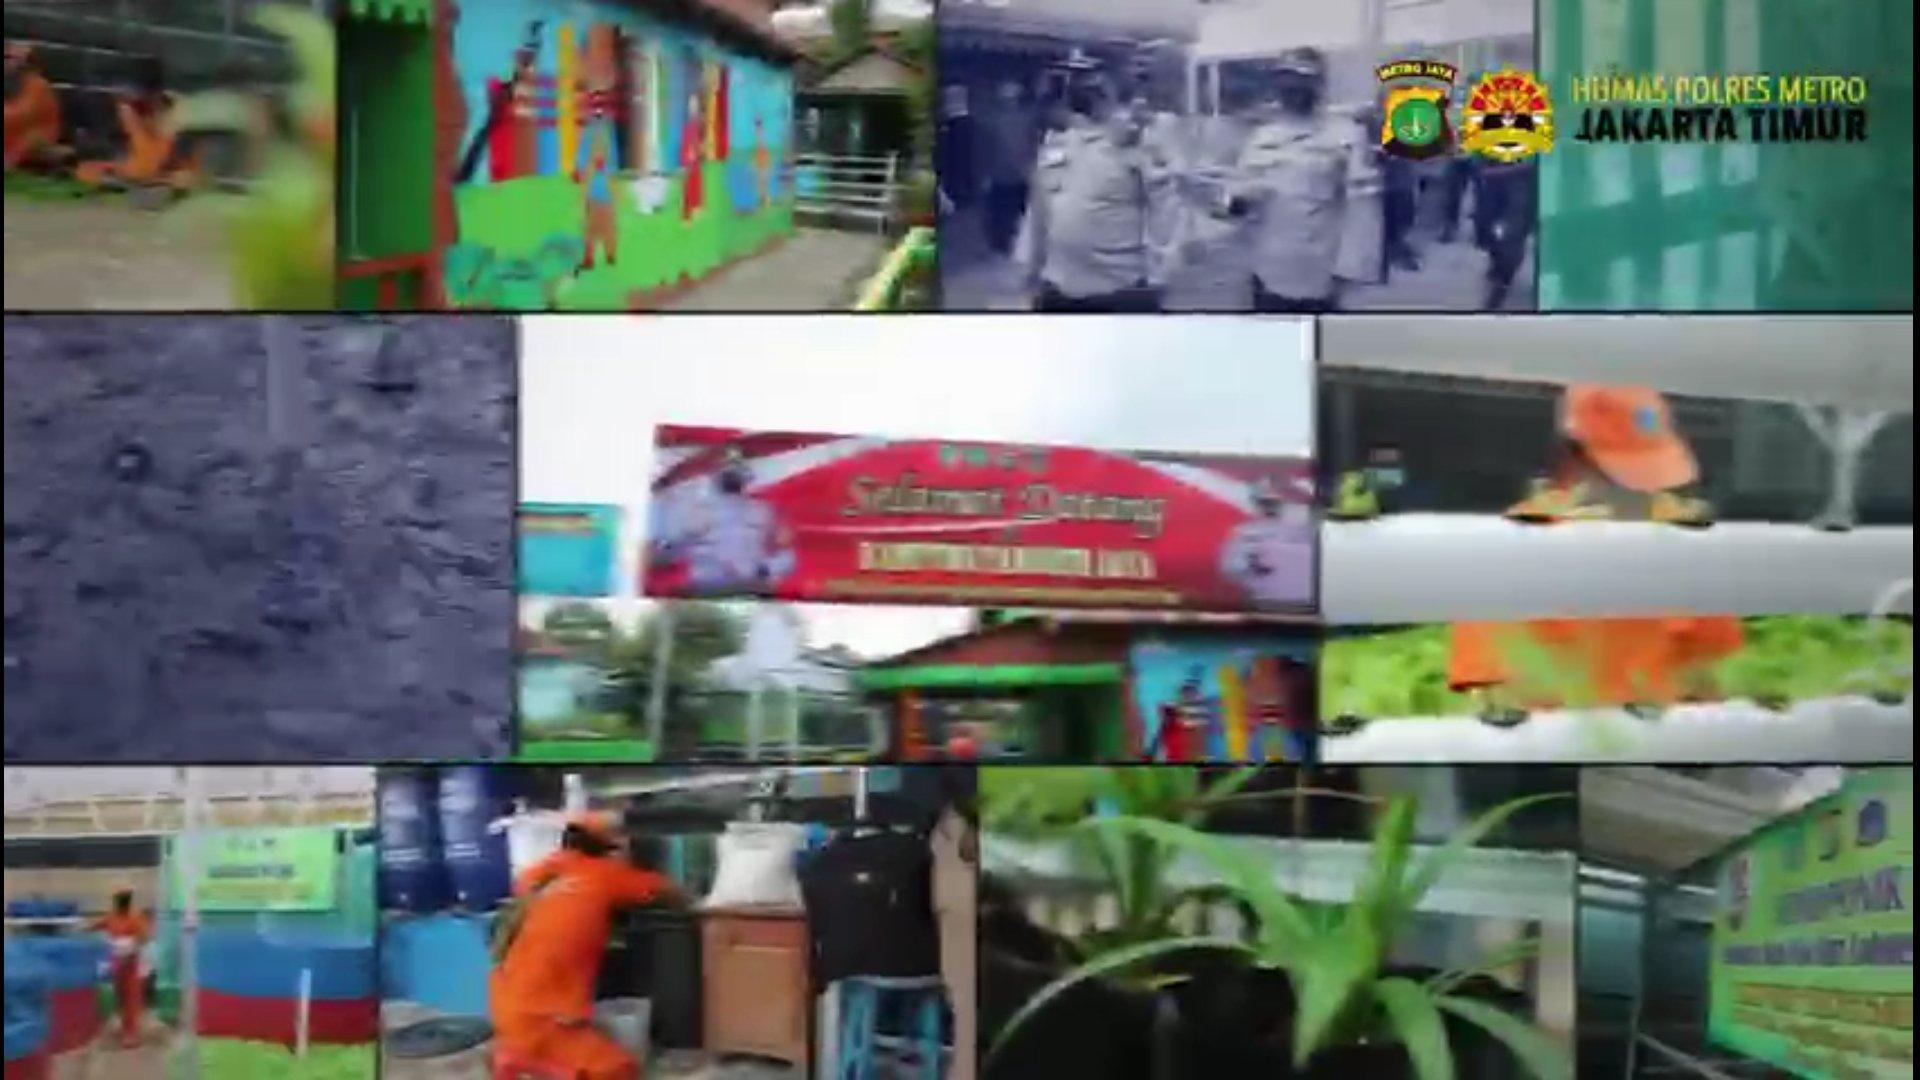 Gagasan Kapolda Metro Jaya 'Kampung Tangguh' Membuahkan Hasil Menggembirakan